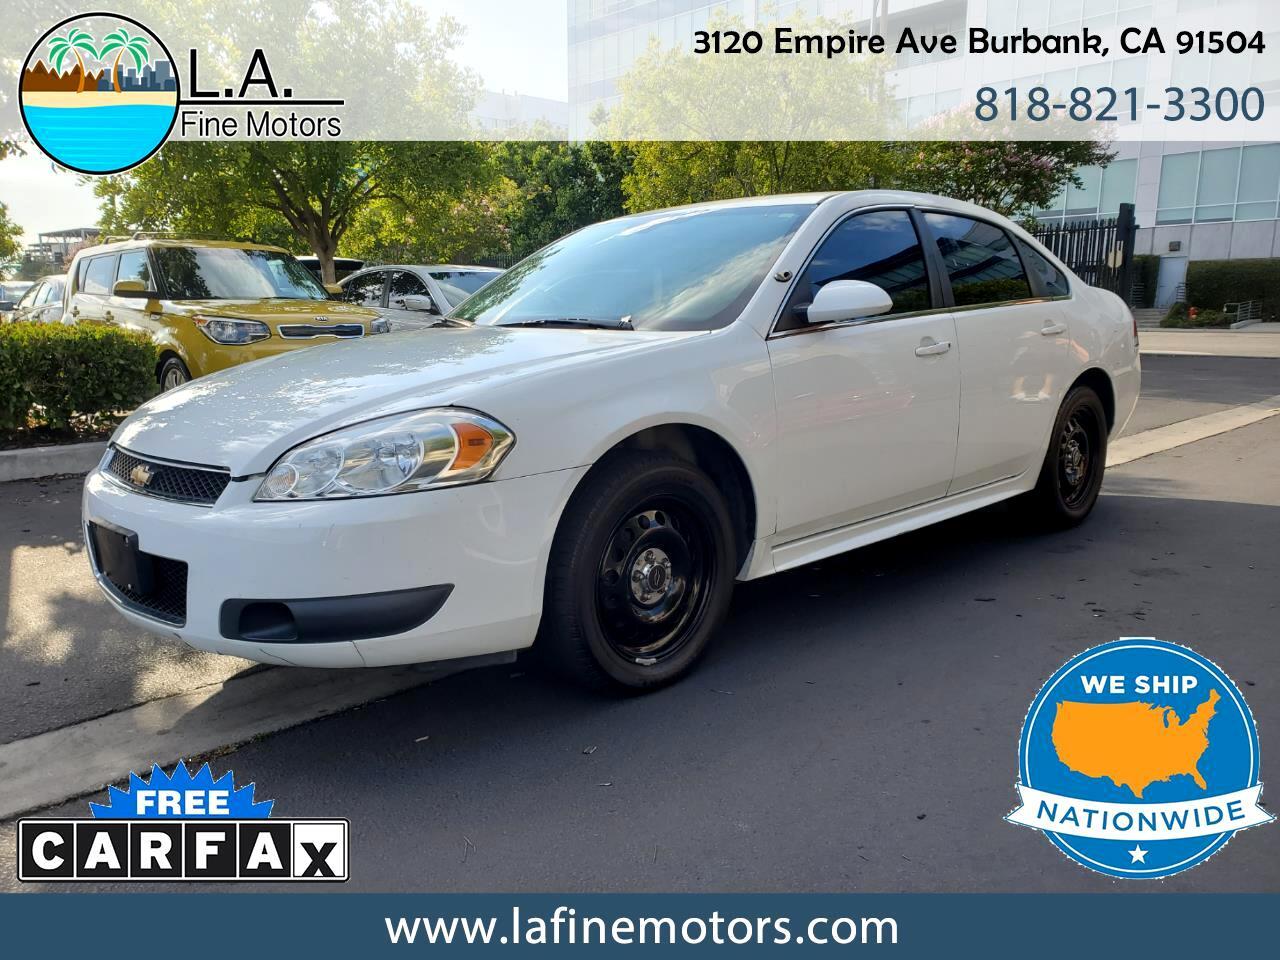 Chevrolet Impala Limited Police Cruiser 2016